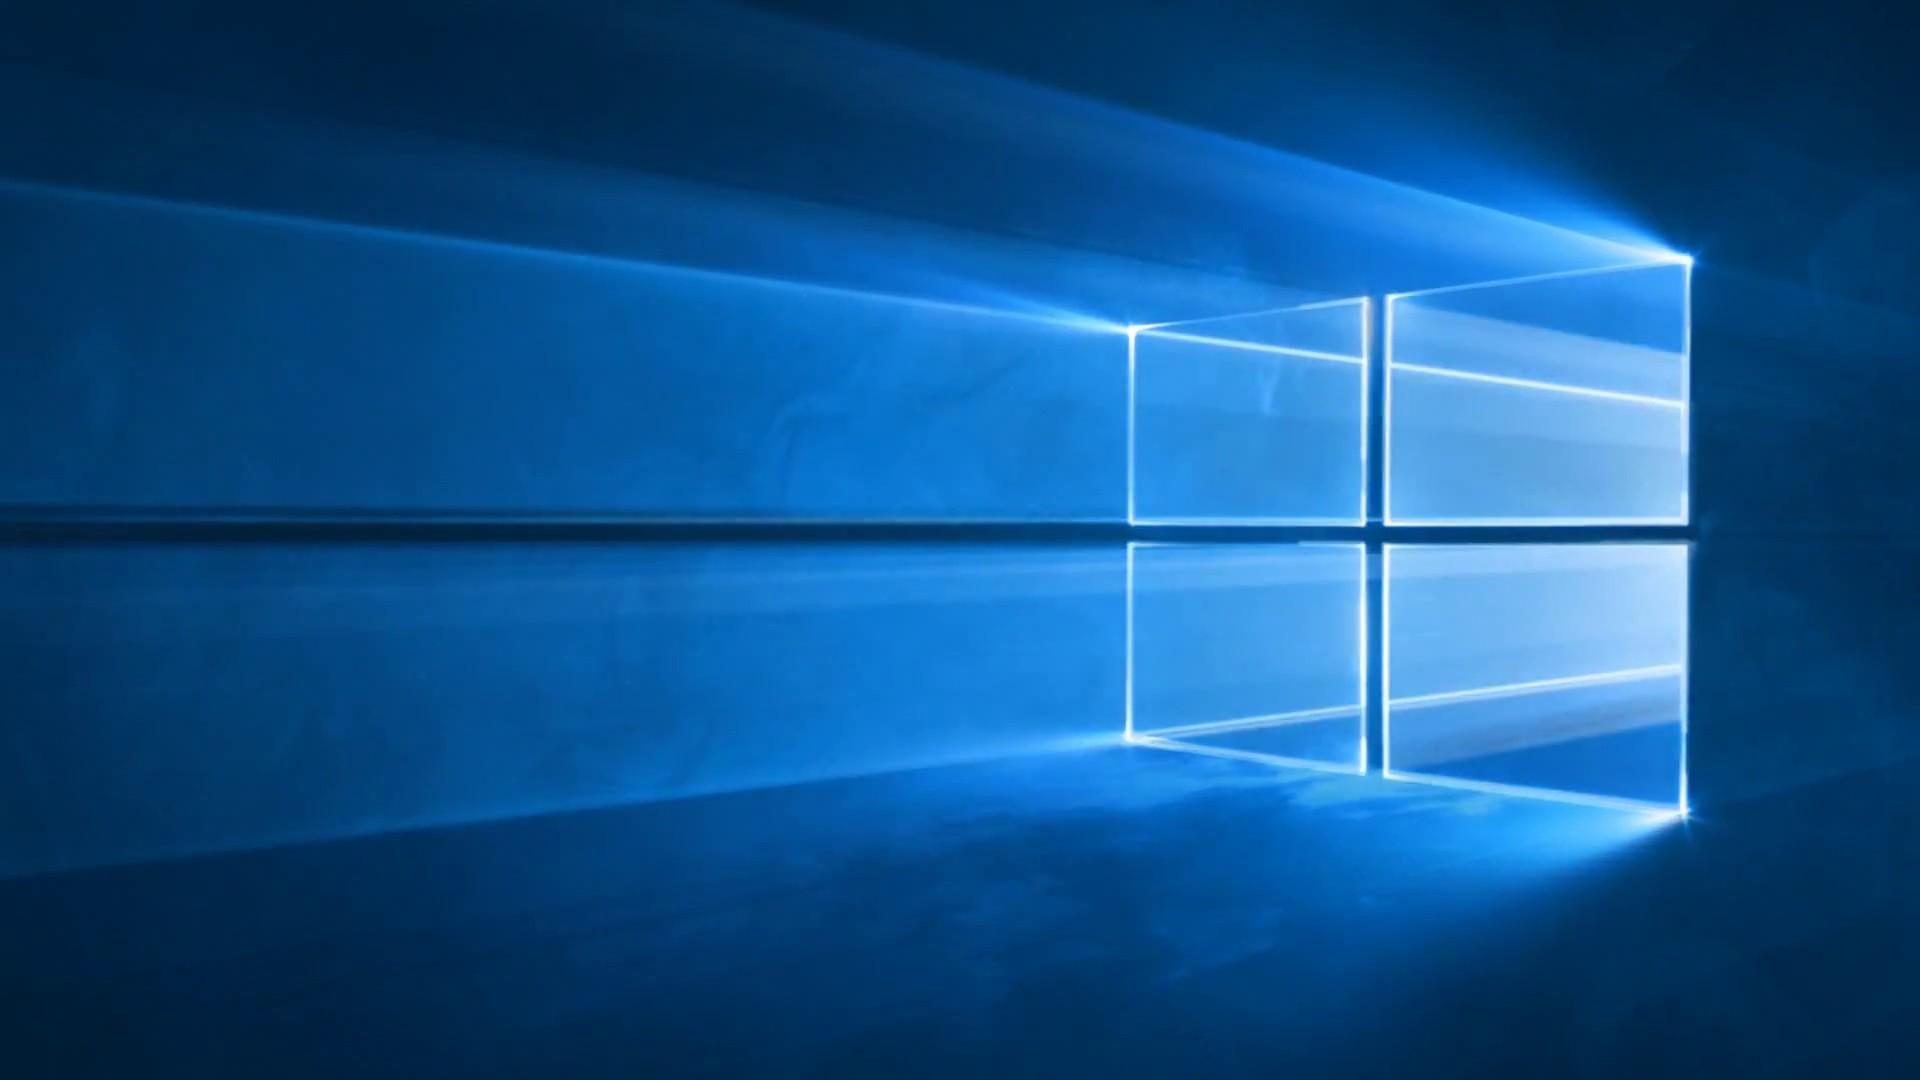 microsoft wallpaper themes windows 10